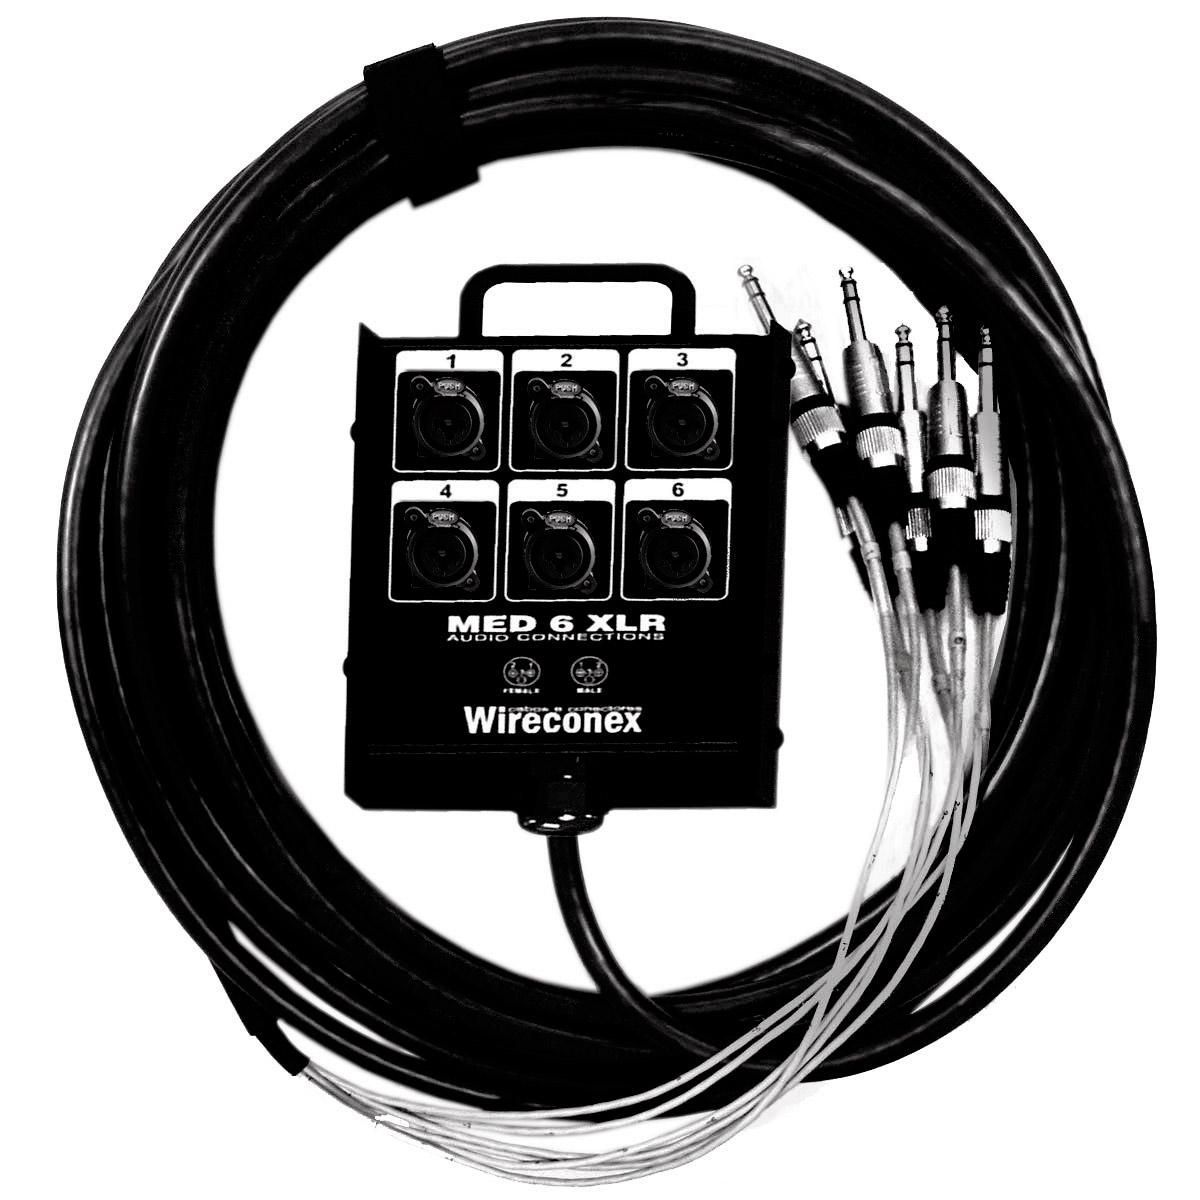 Multicabo Completo 06 Vias Combo XLR / P10 c/Trava 10 Metros - VR CABOS